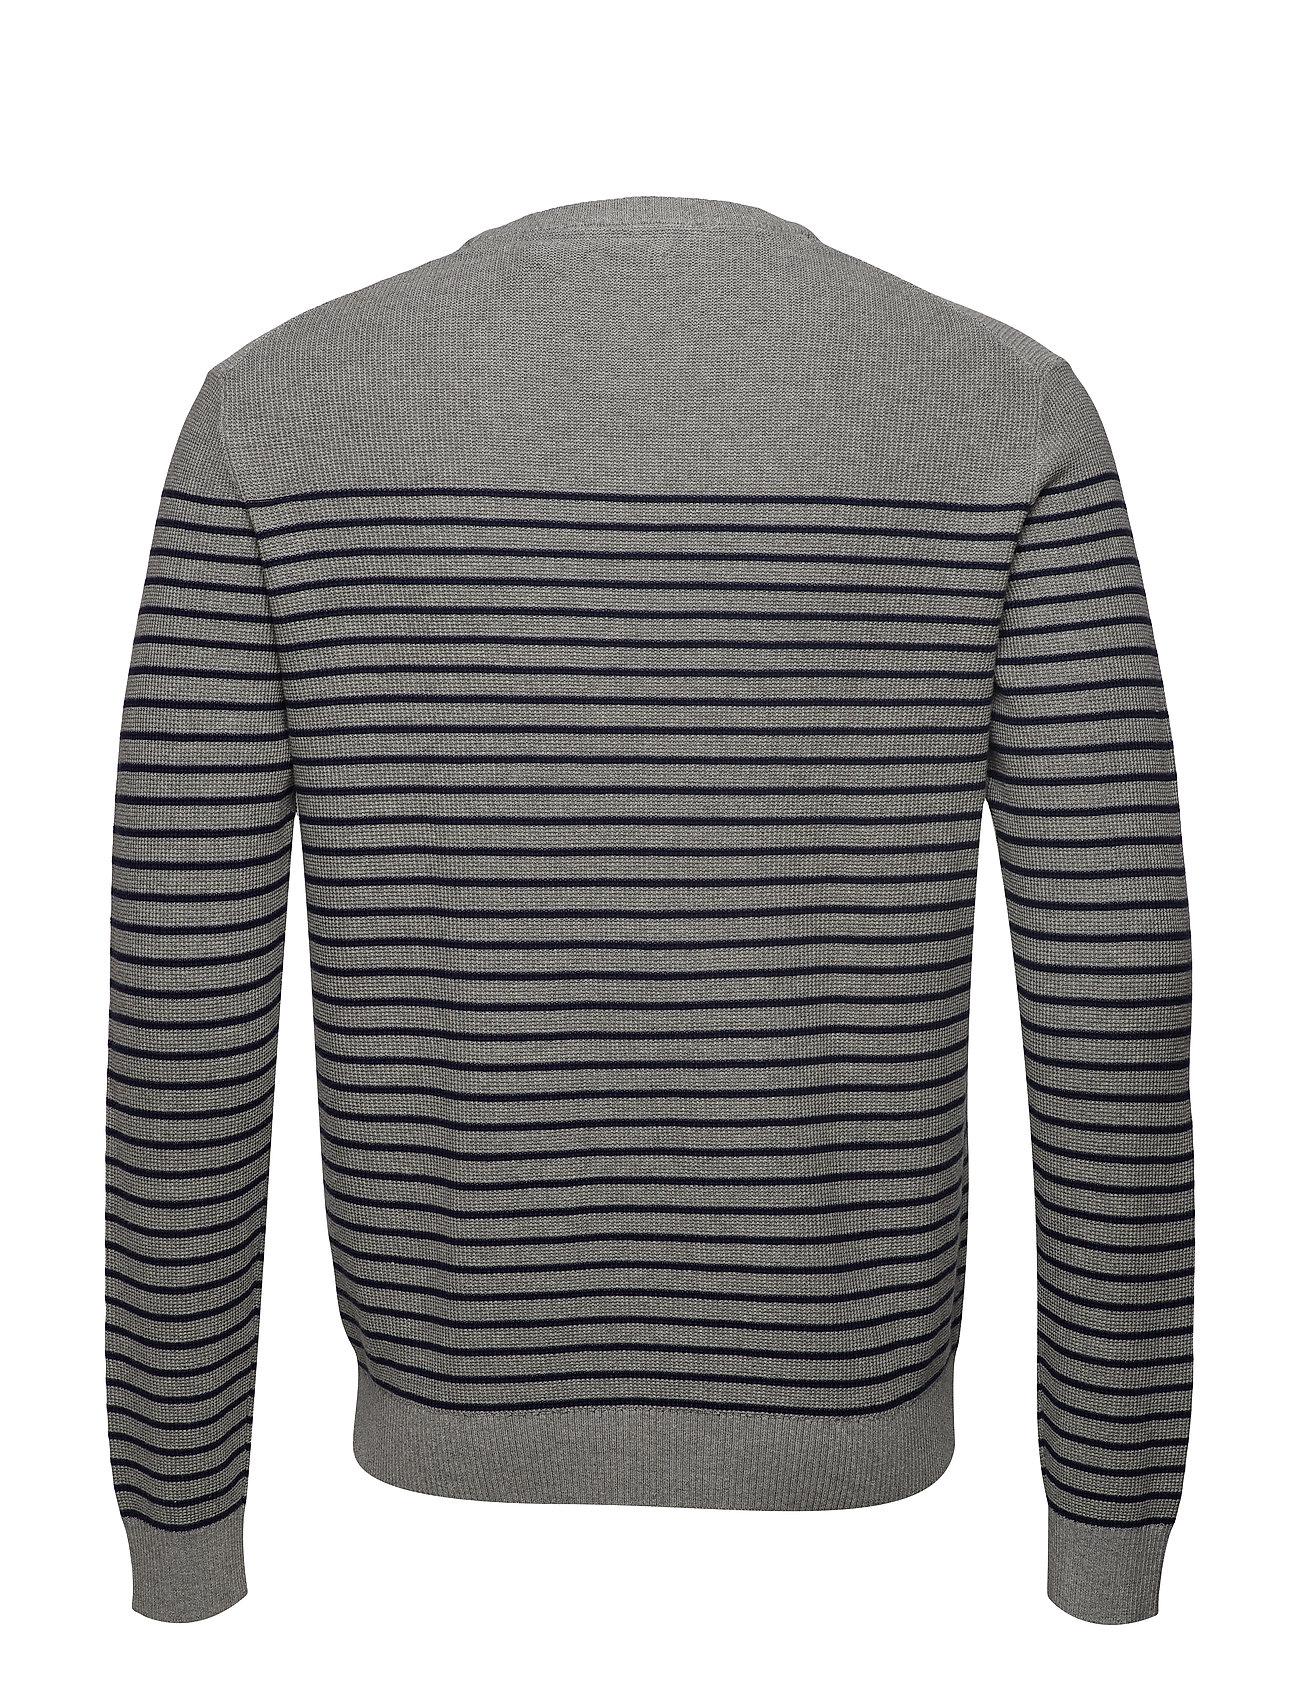 12gg Engineered Grey Sweaterlt Stripe HtrIzod e9YEW2IDHb